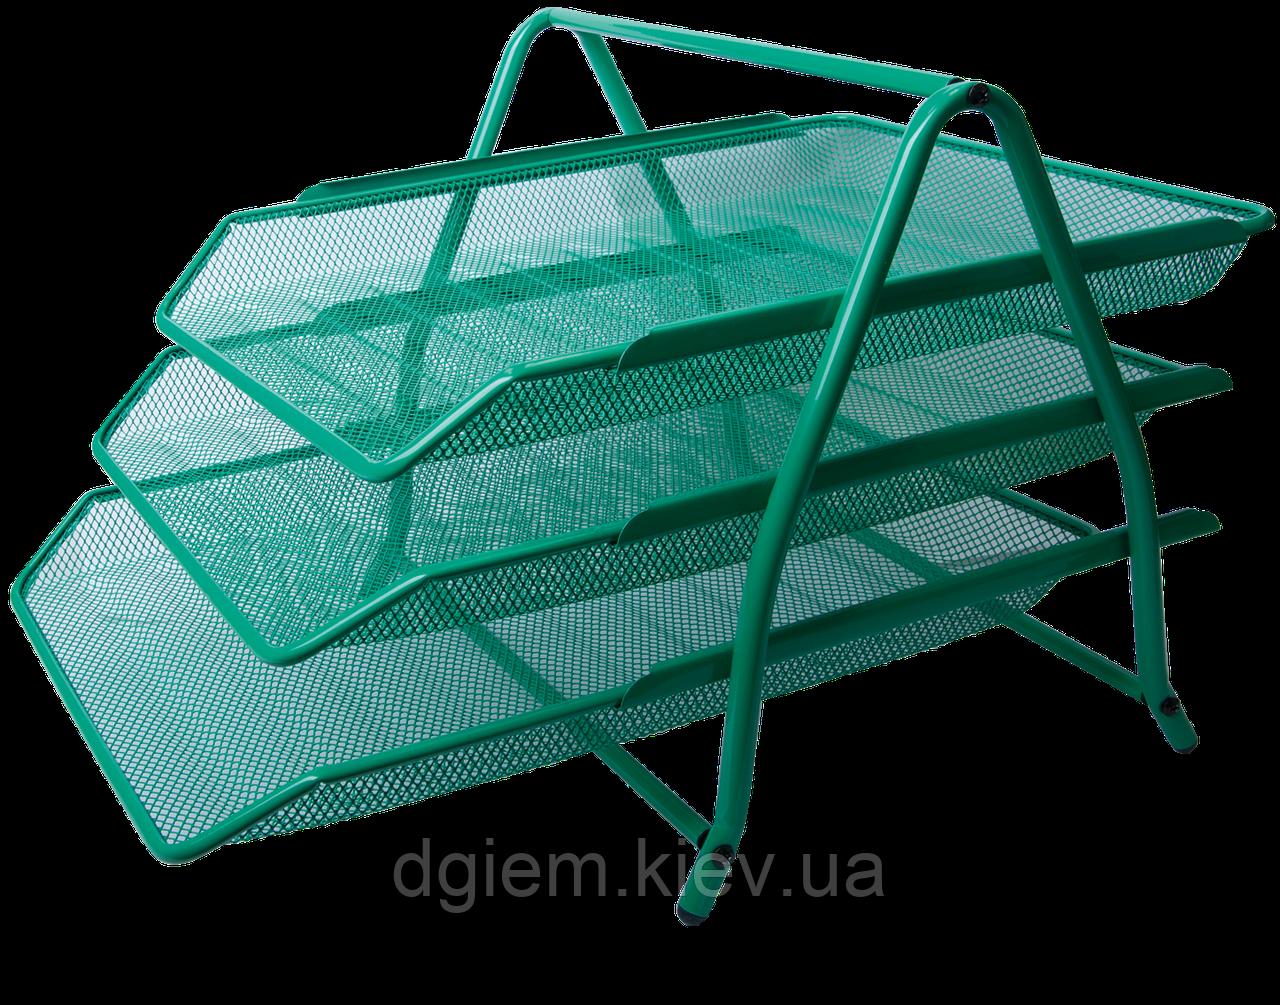 Лоток горизонтальний 3-х ярусний металевий зелений